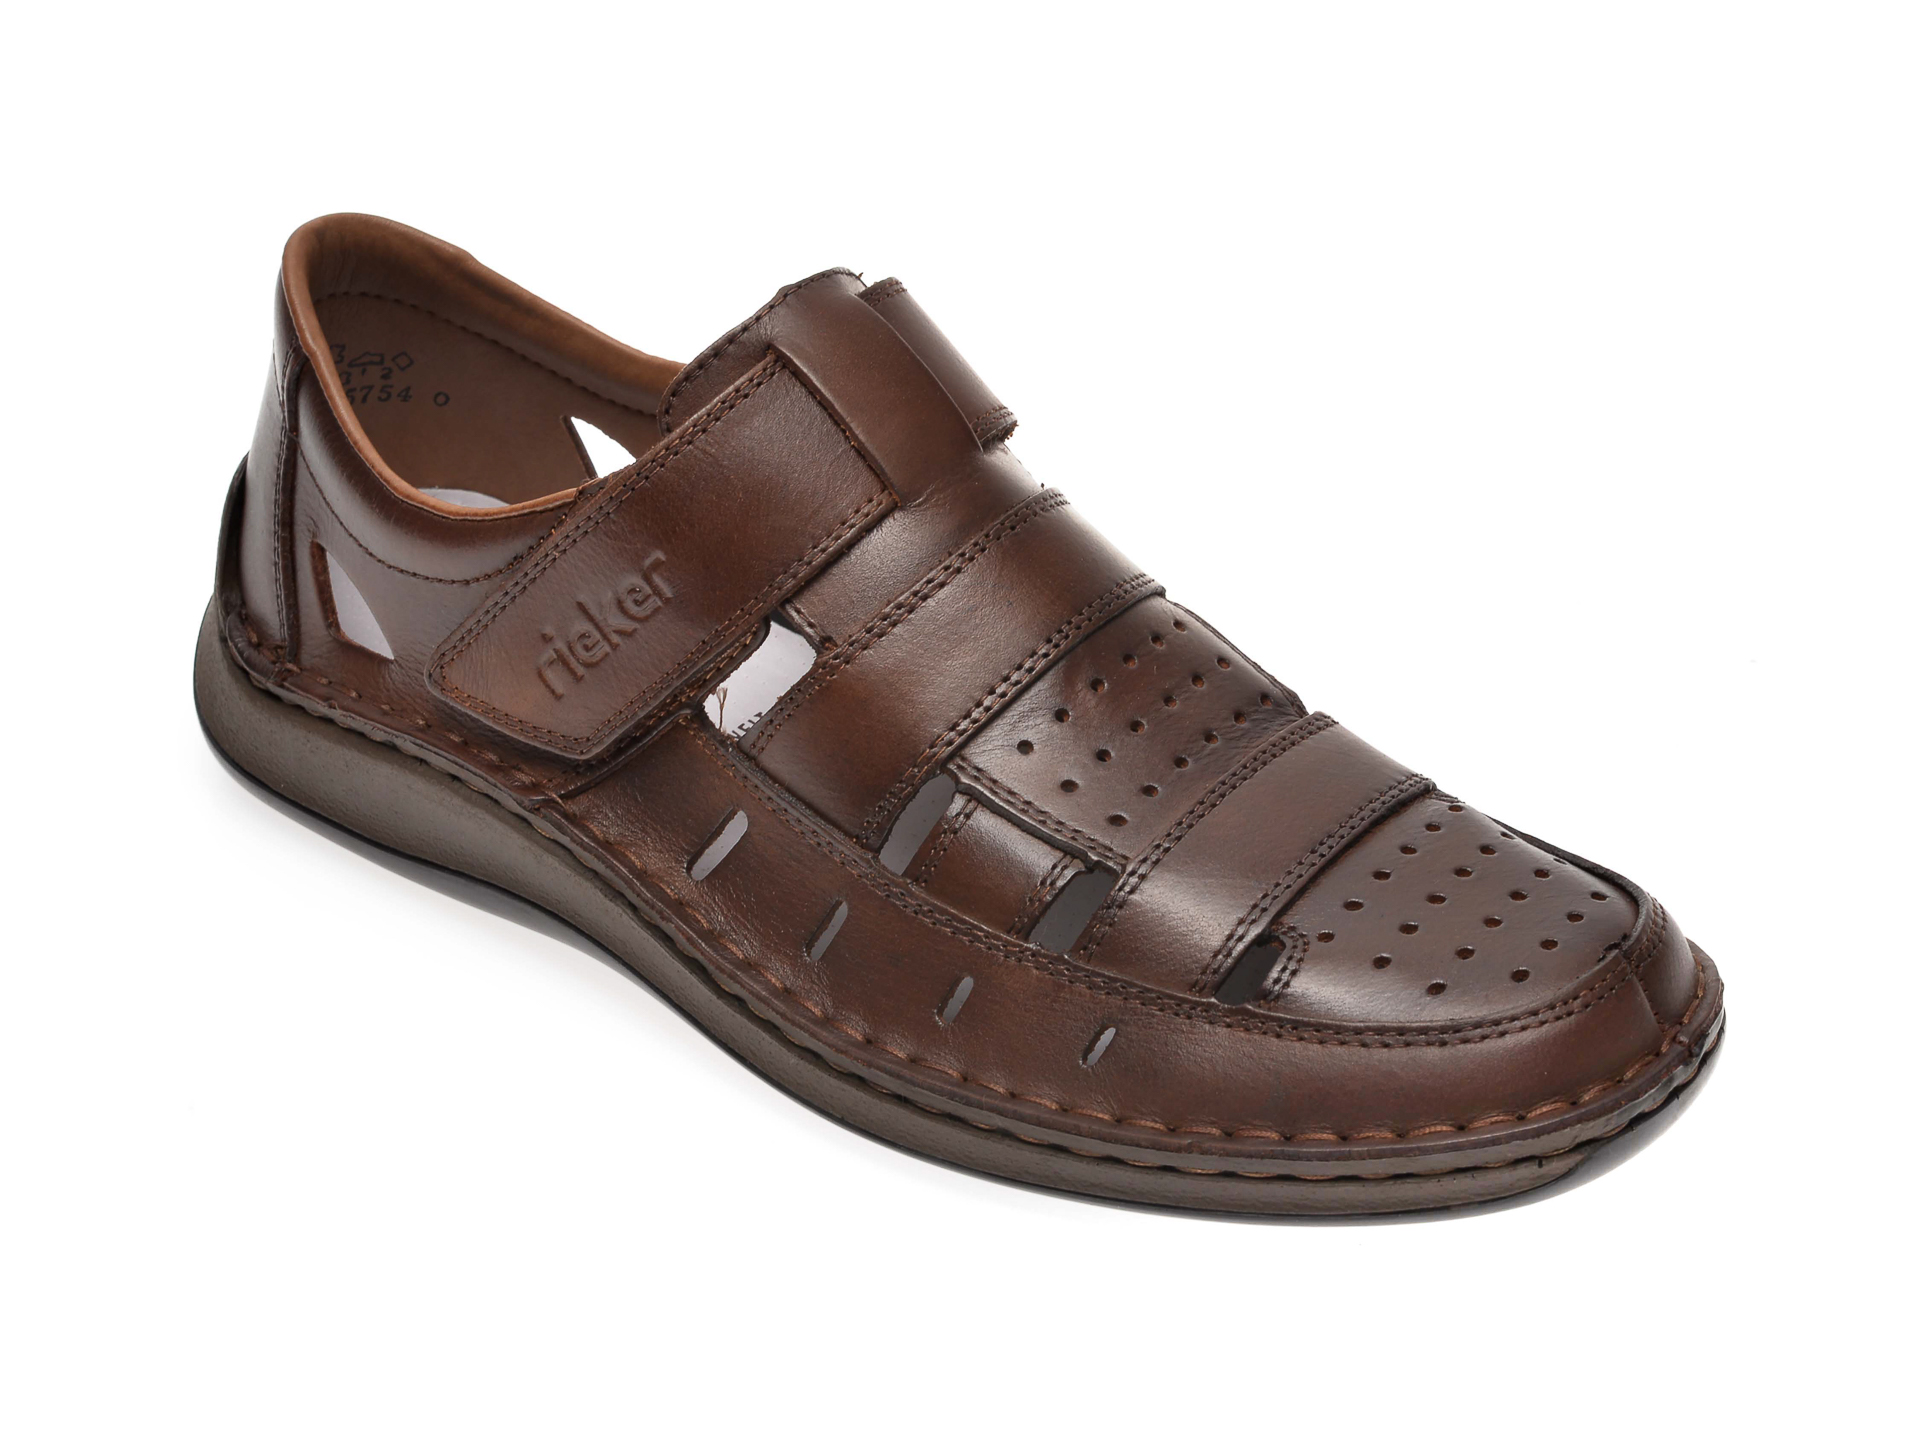 Sandale RIEKER maro, 05268, din piele naturala imagine otter.ro